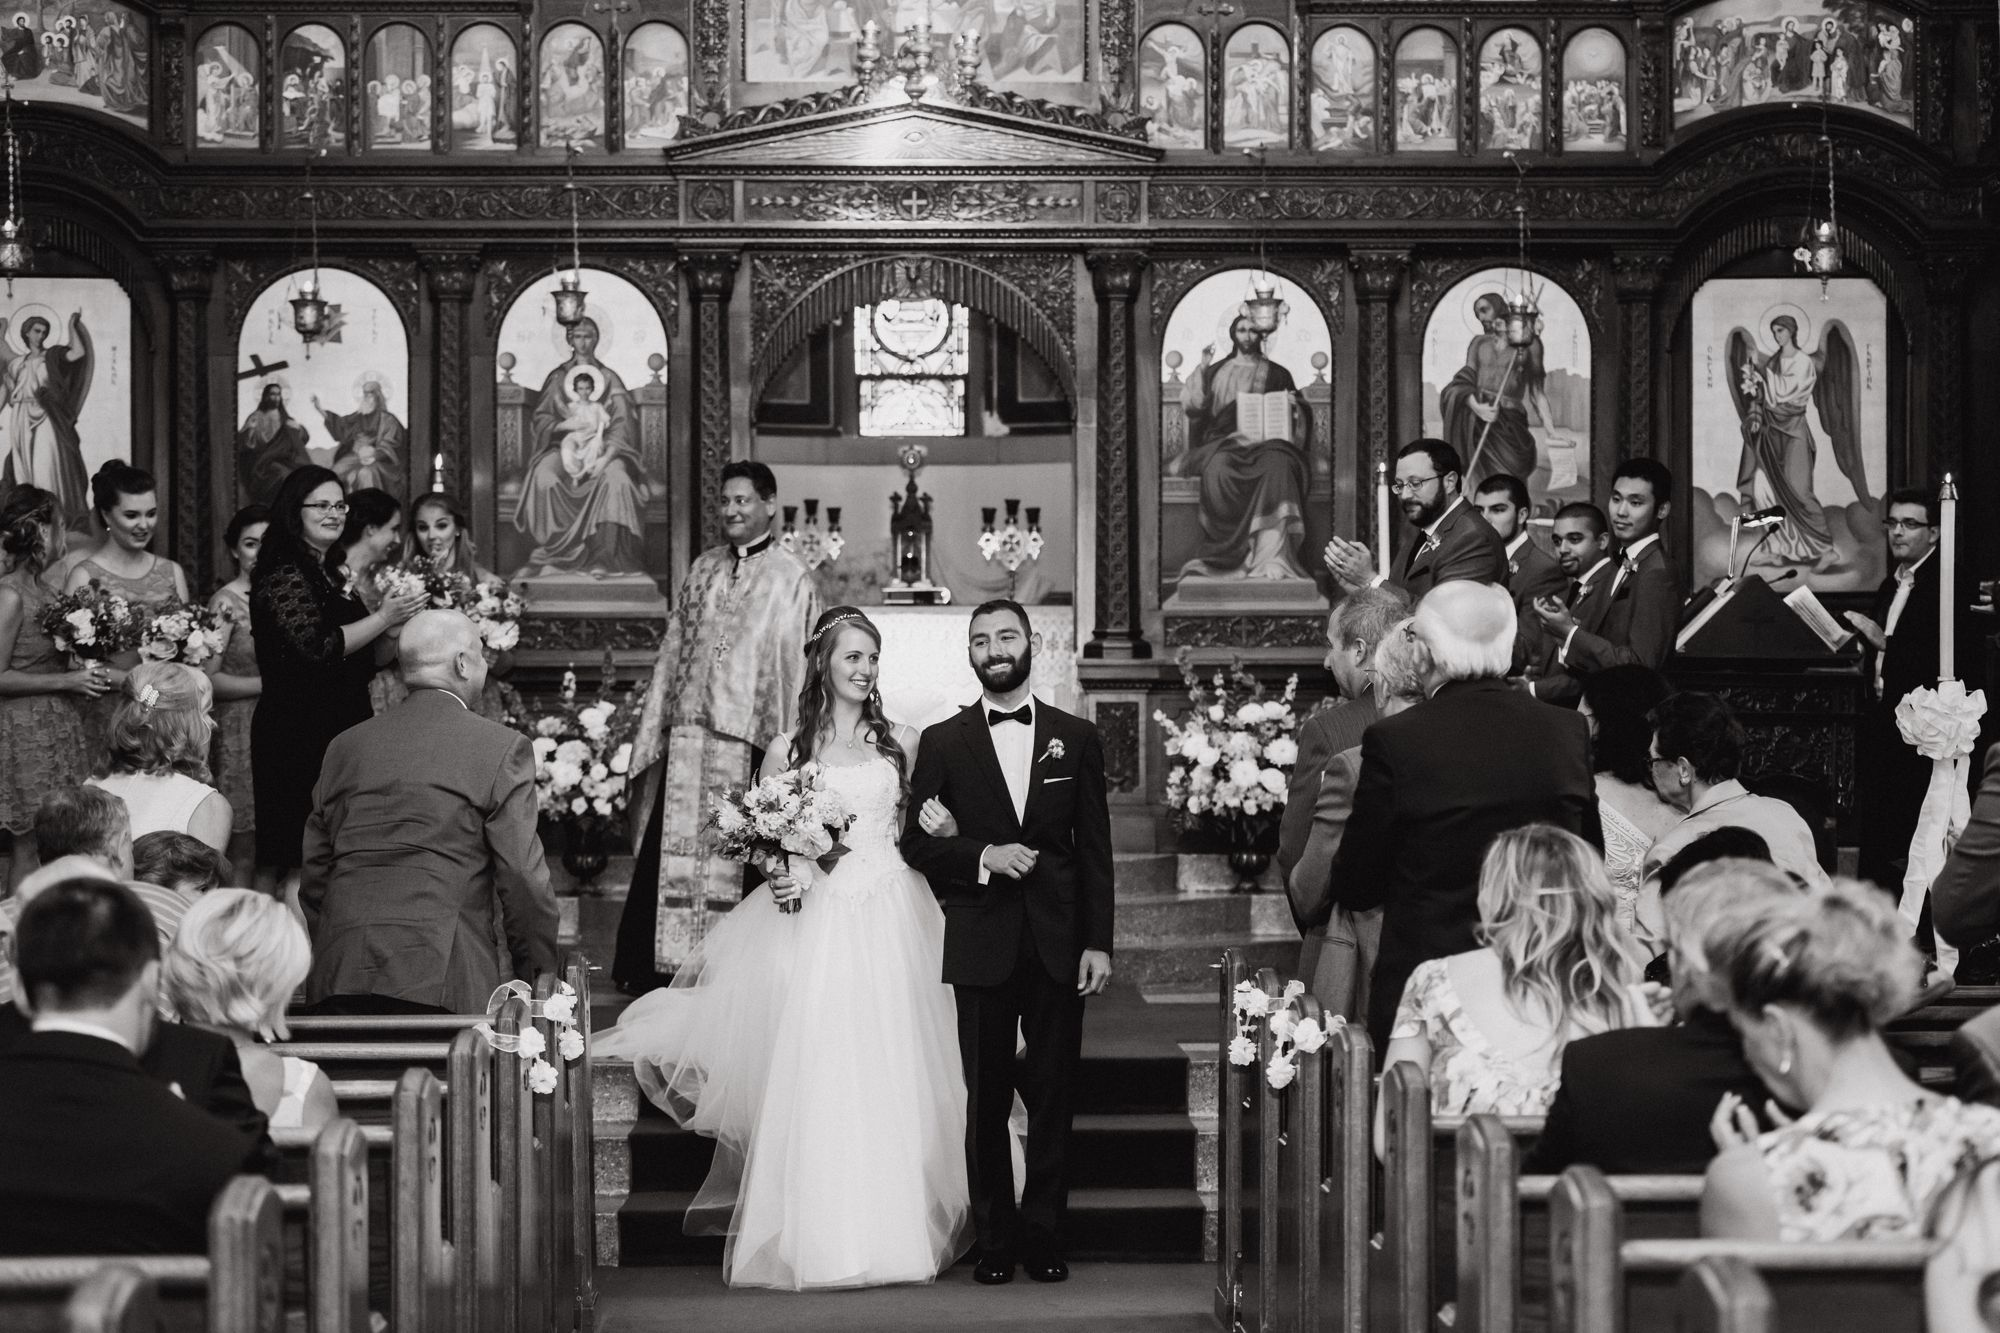 uptown-charlotte-orthodox-greek-wedding 69